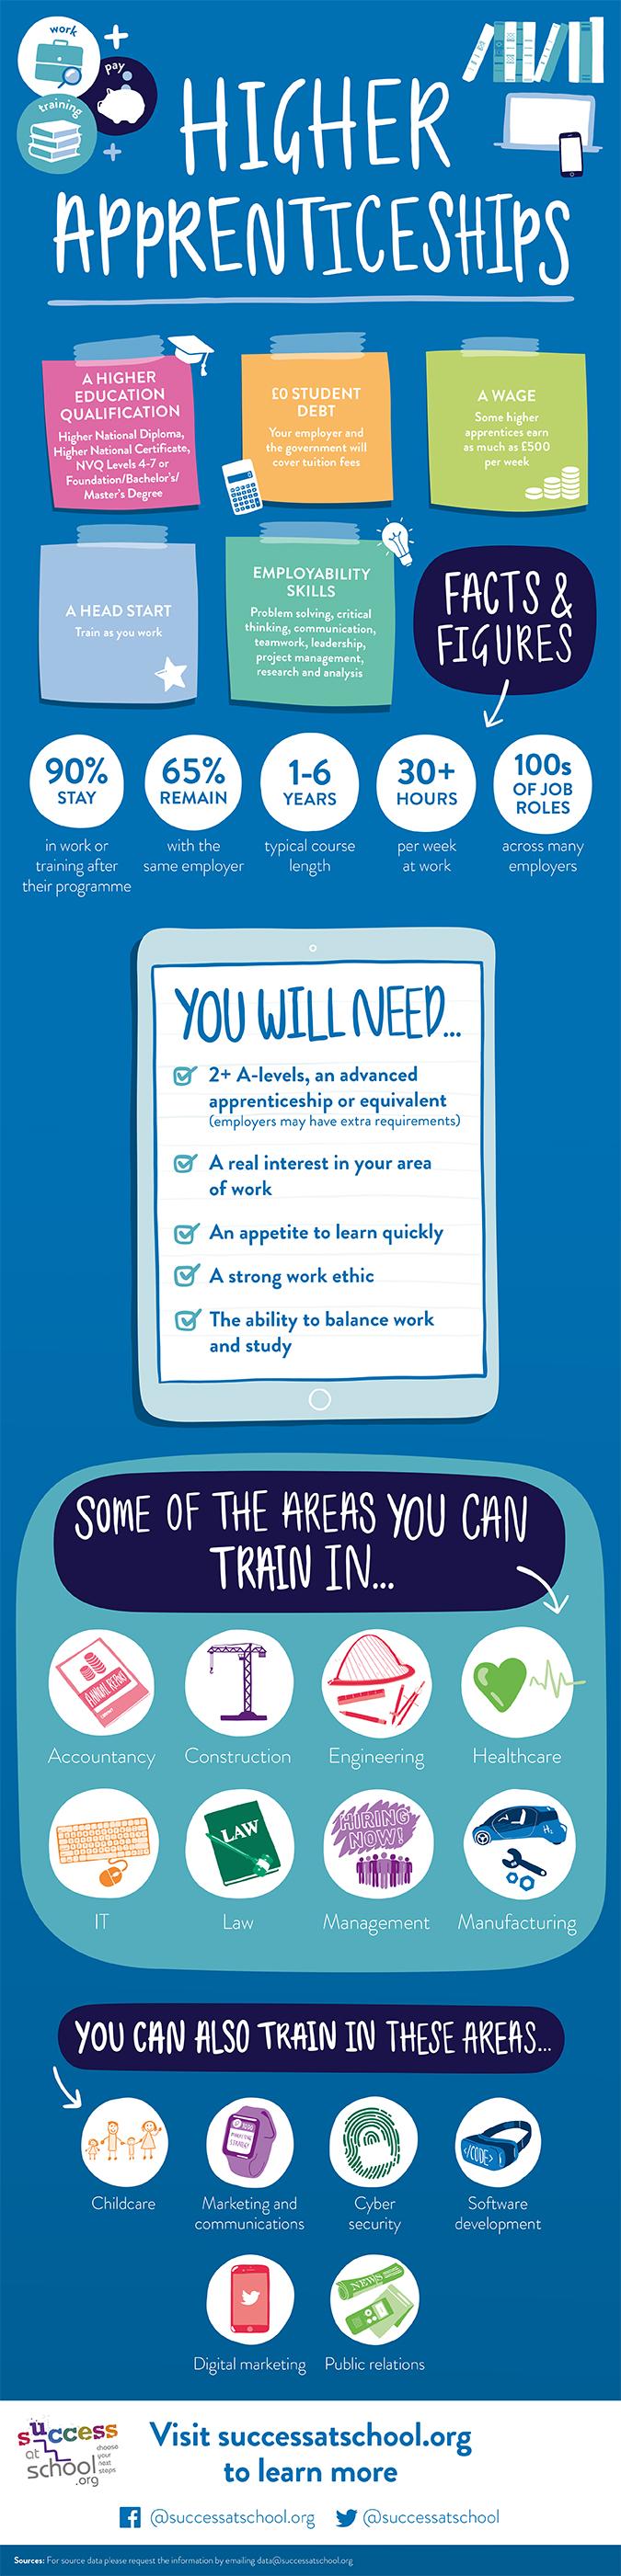 Higher apprenticeships infographic